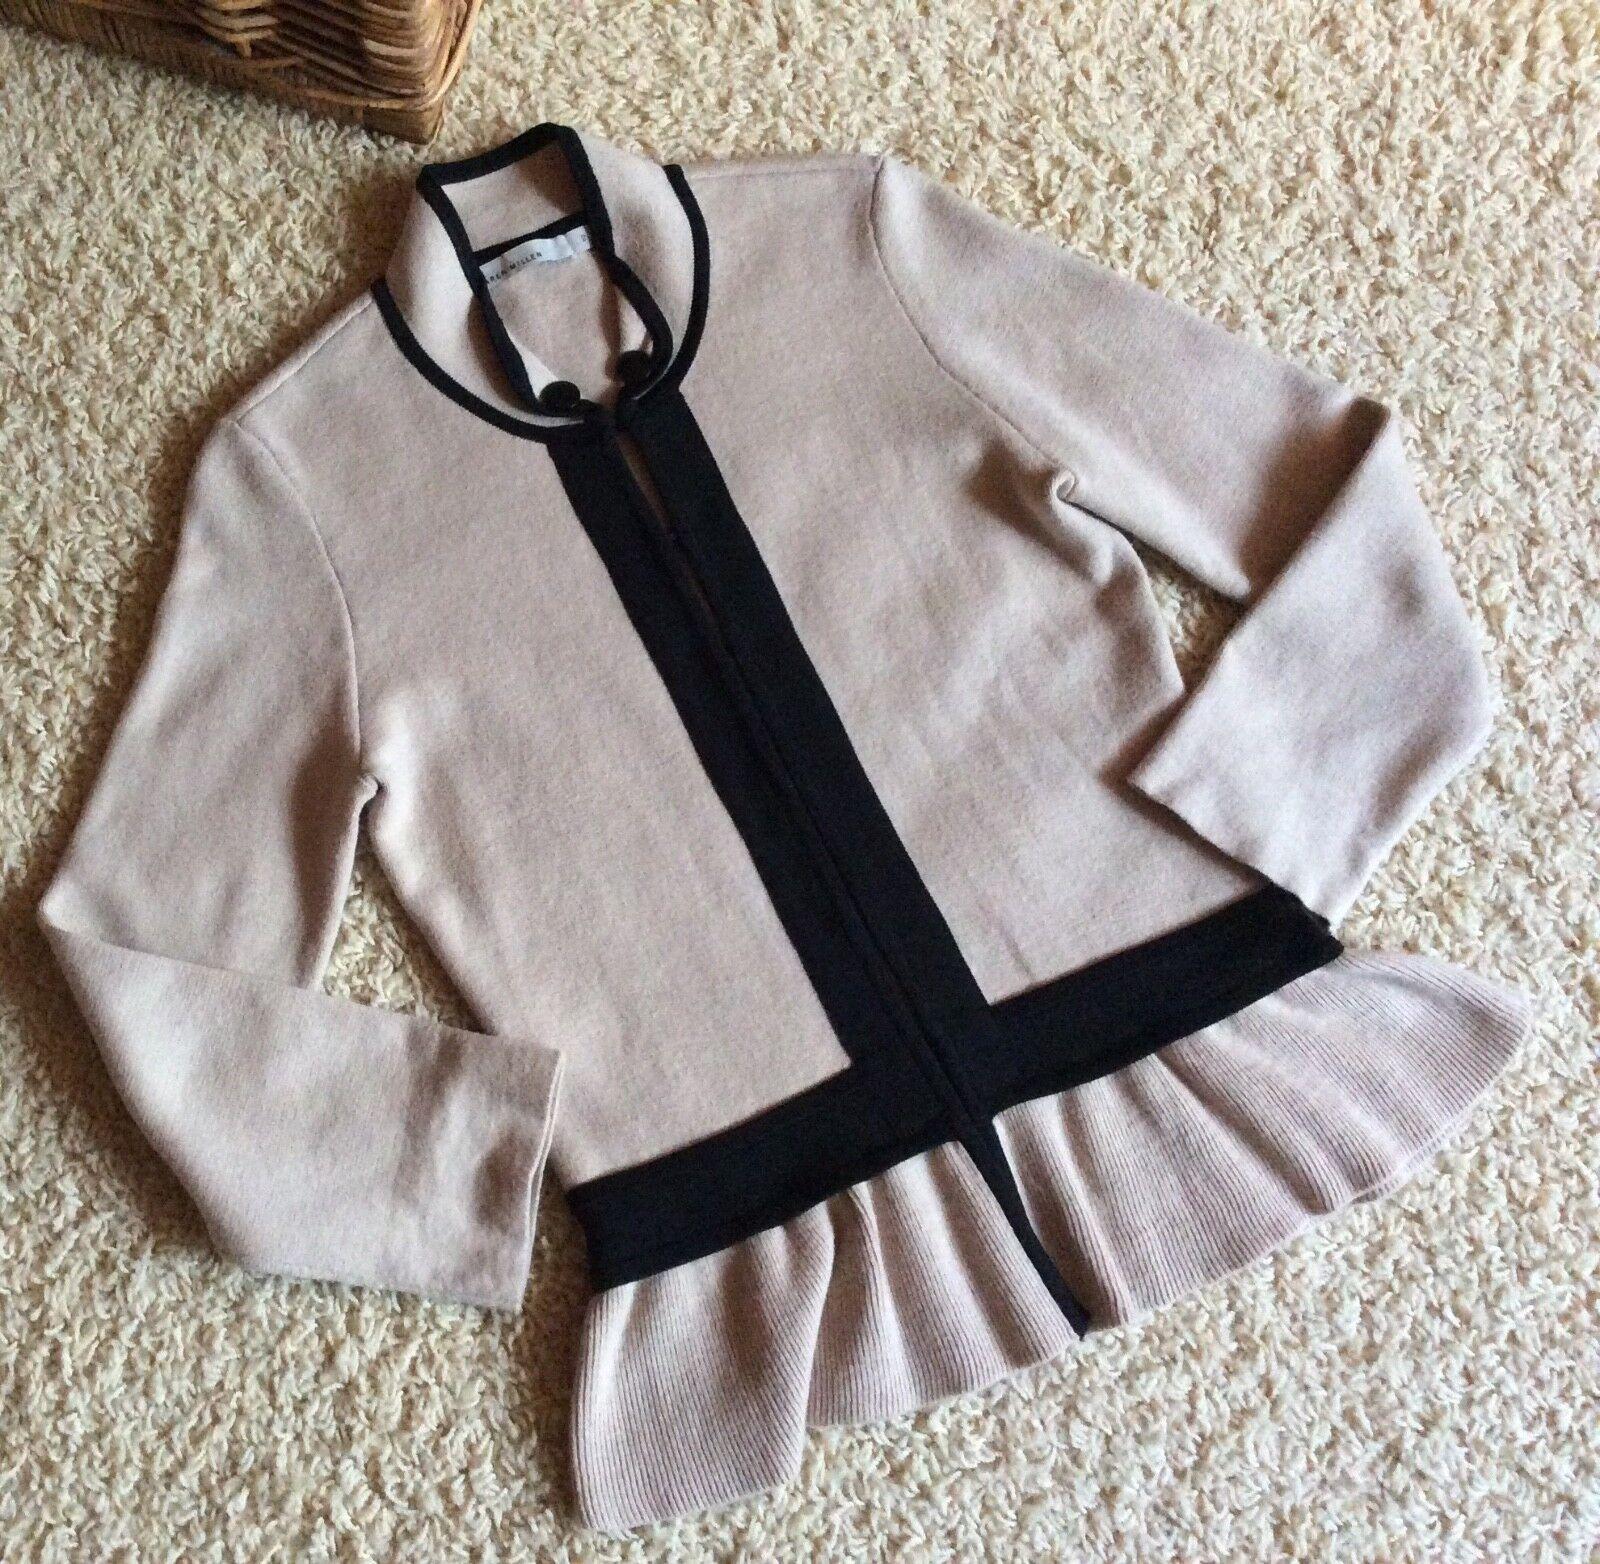 Karen Millen Knit Cardigan jumper oben Größe 2 , uk 10-12 = s -m